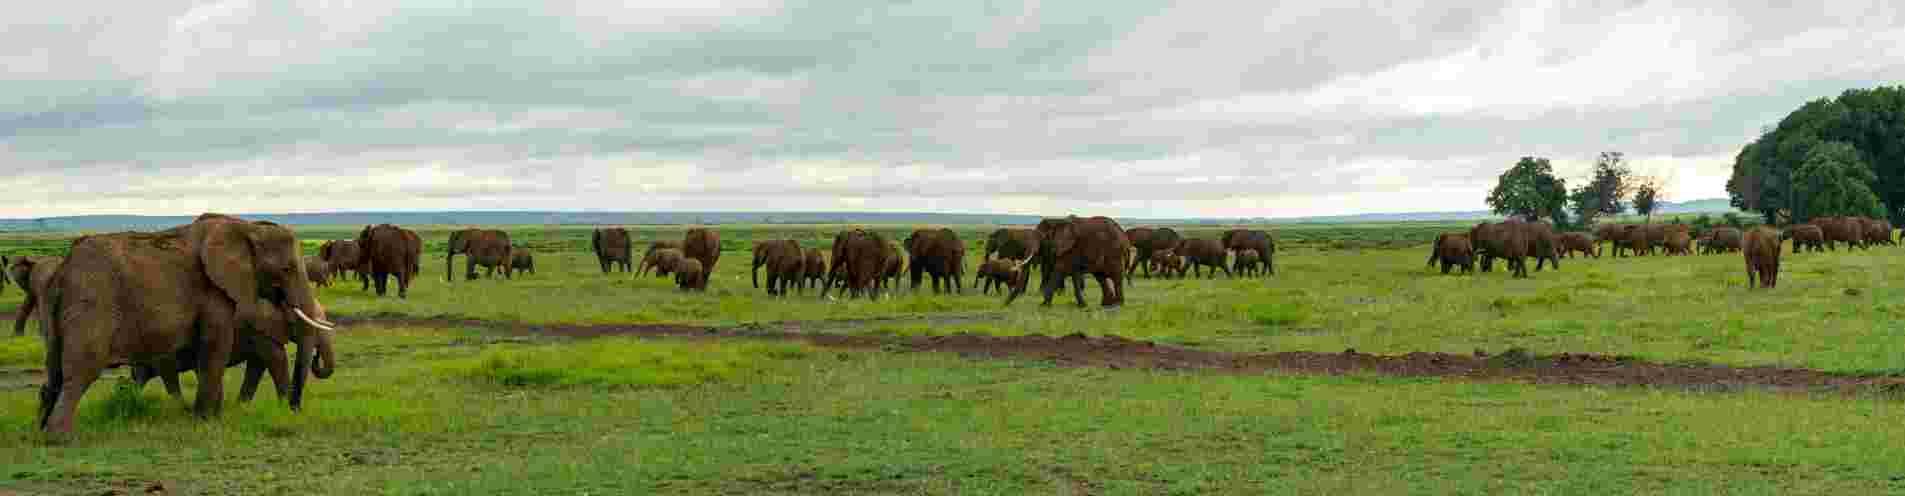 Kenya header image